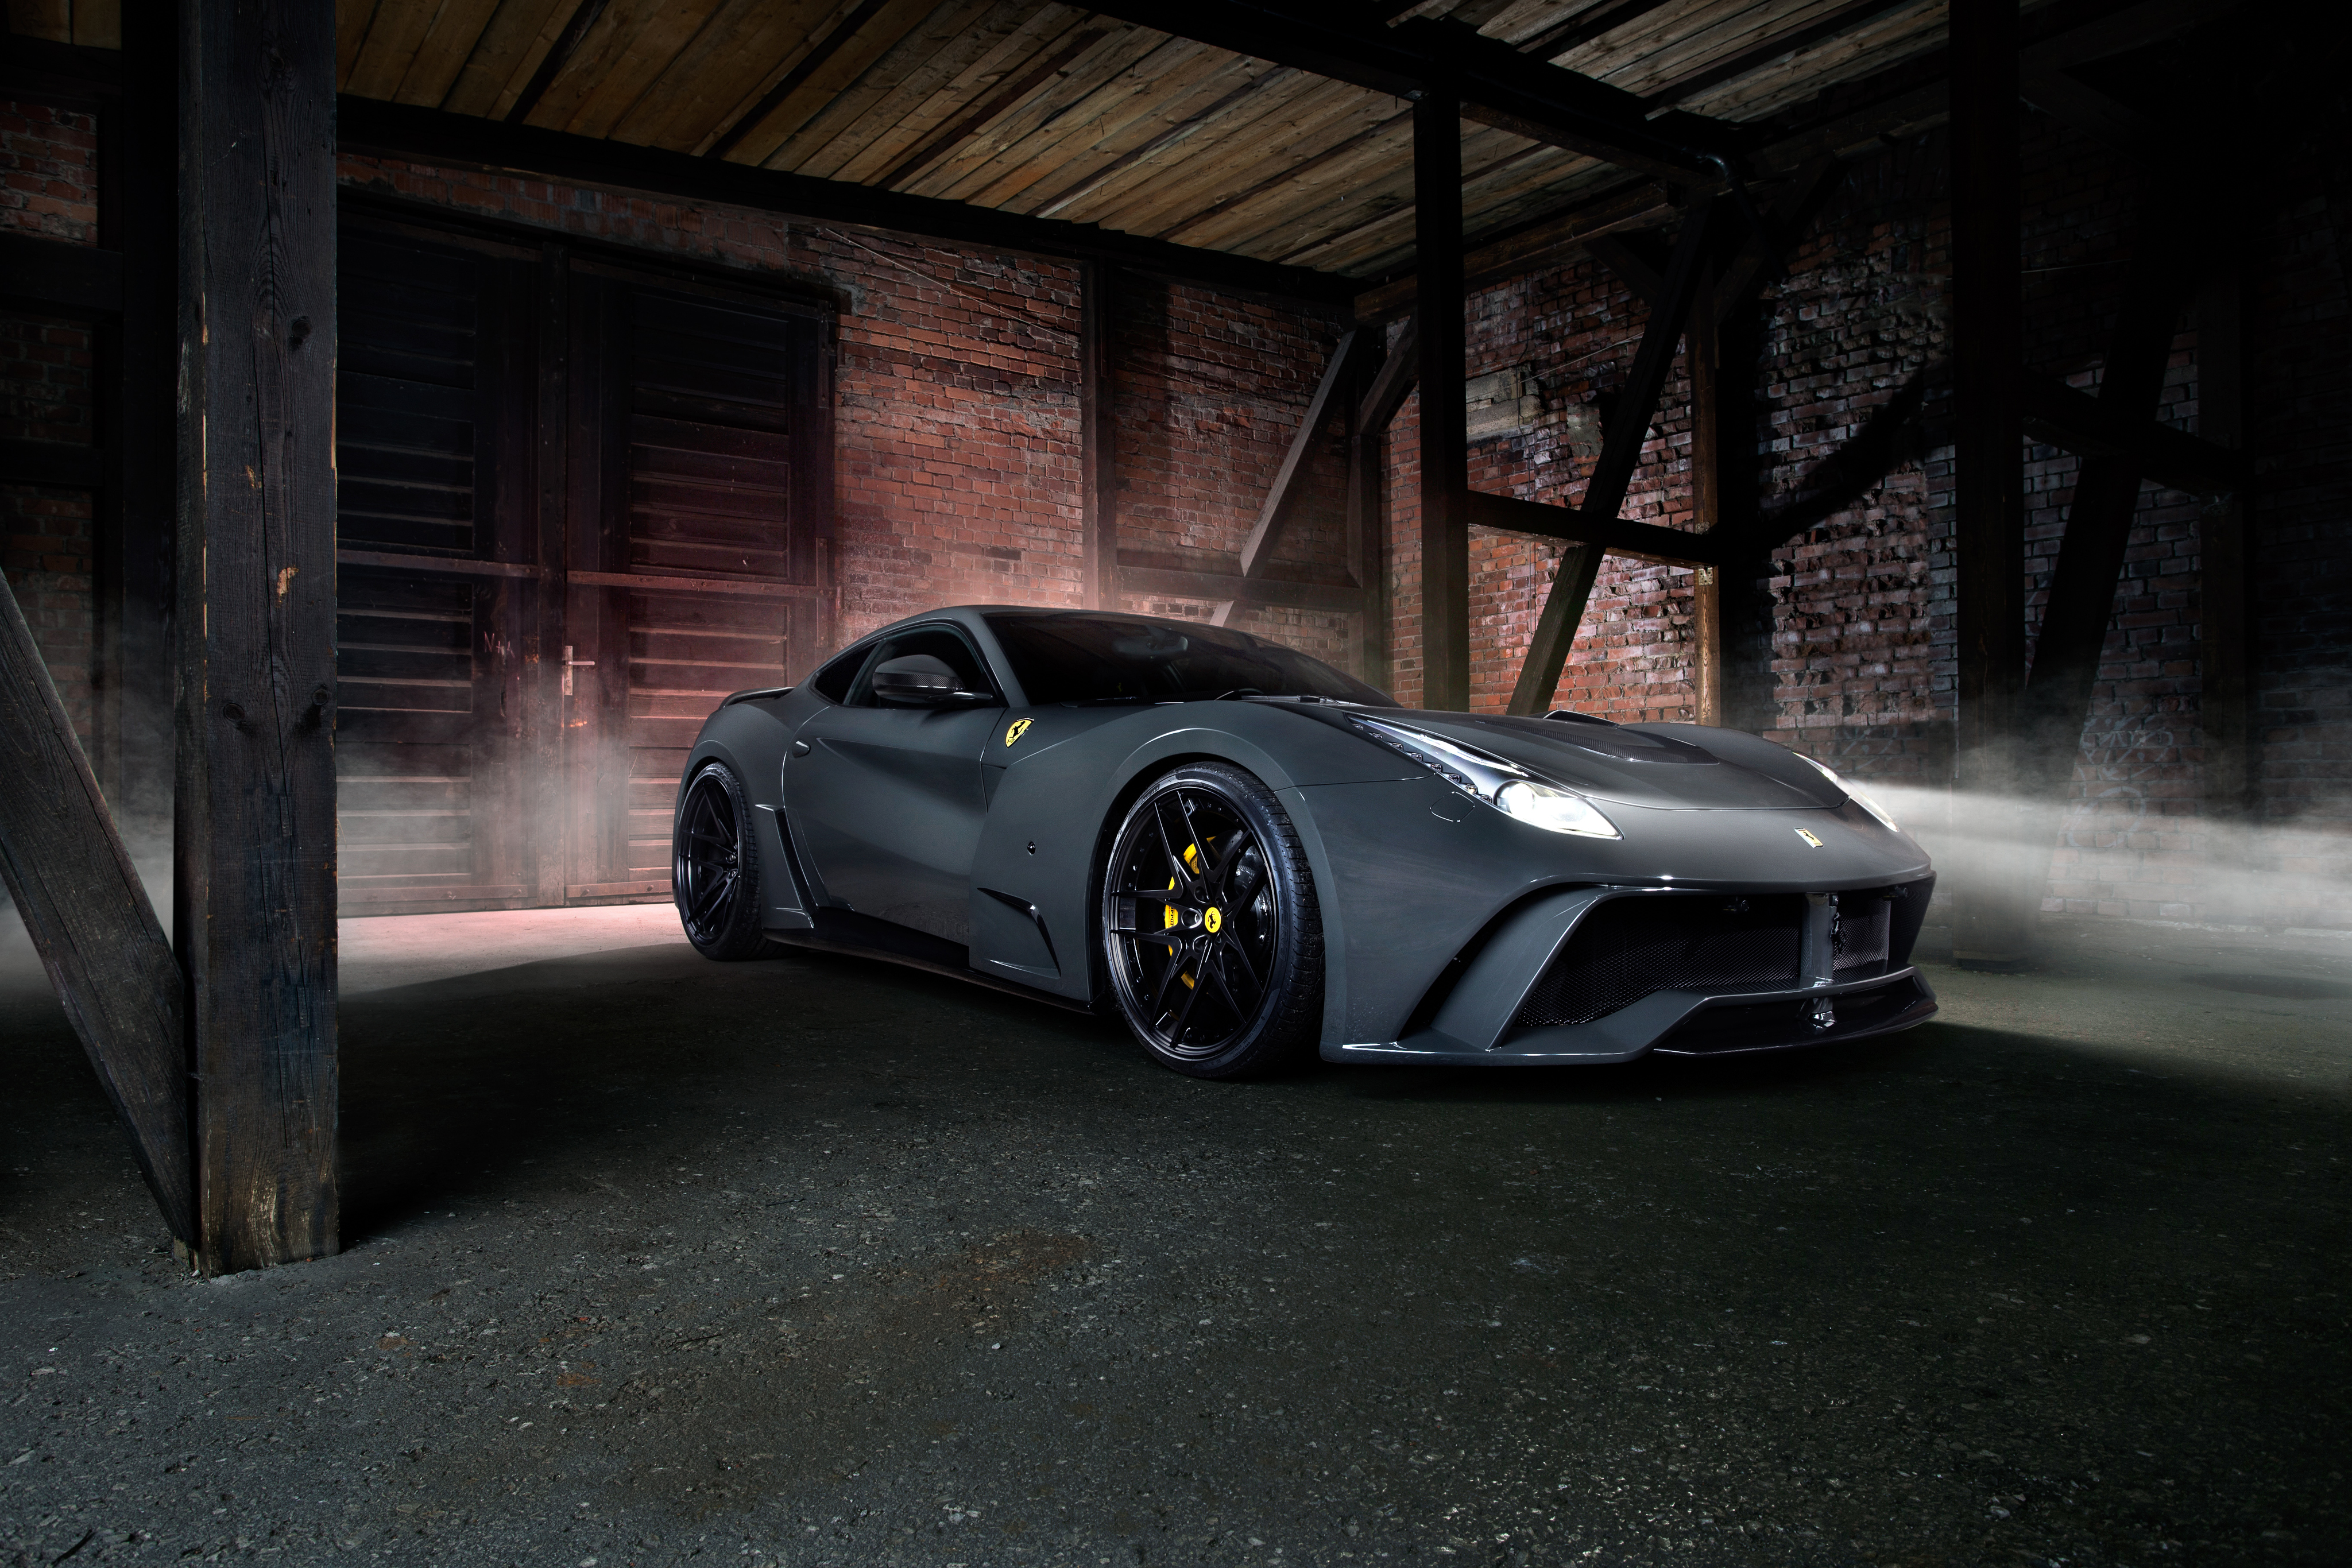 Black Car Novitec Rosso Ferrari F12 Berlinetta Wallpapers ID757610